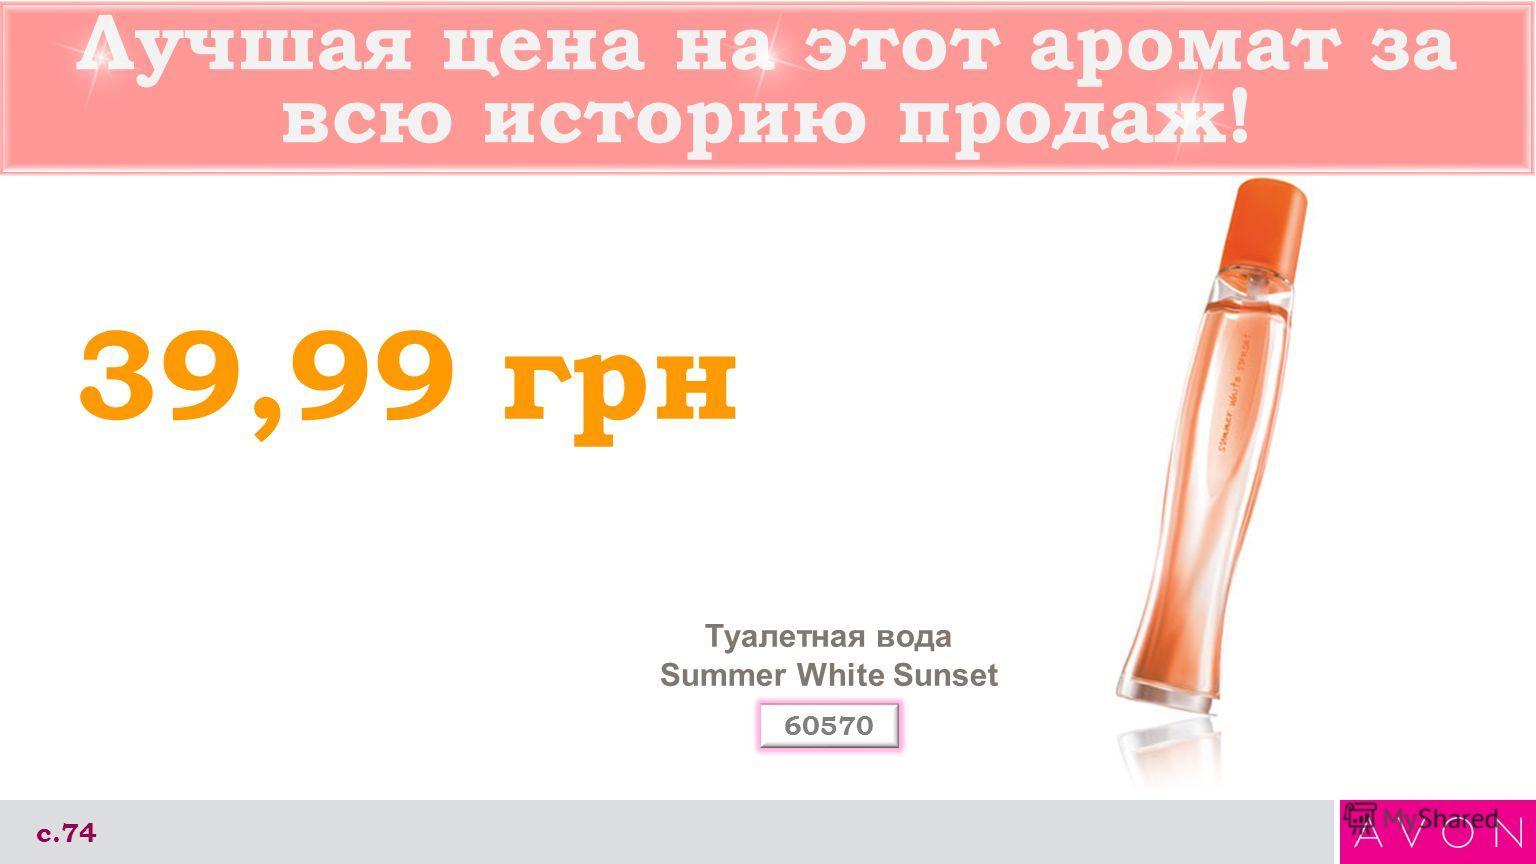 Лучшая цена на этот аромат за всю историю продаж! с.74 39,99 грн Туалетная вода Summer White Sunset 60570